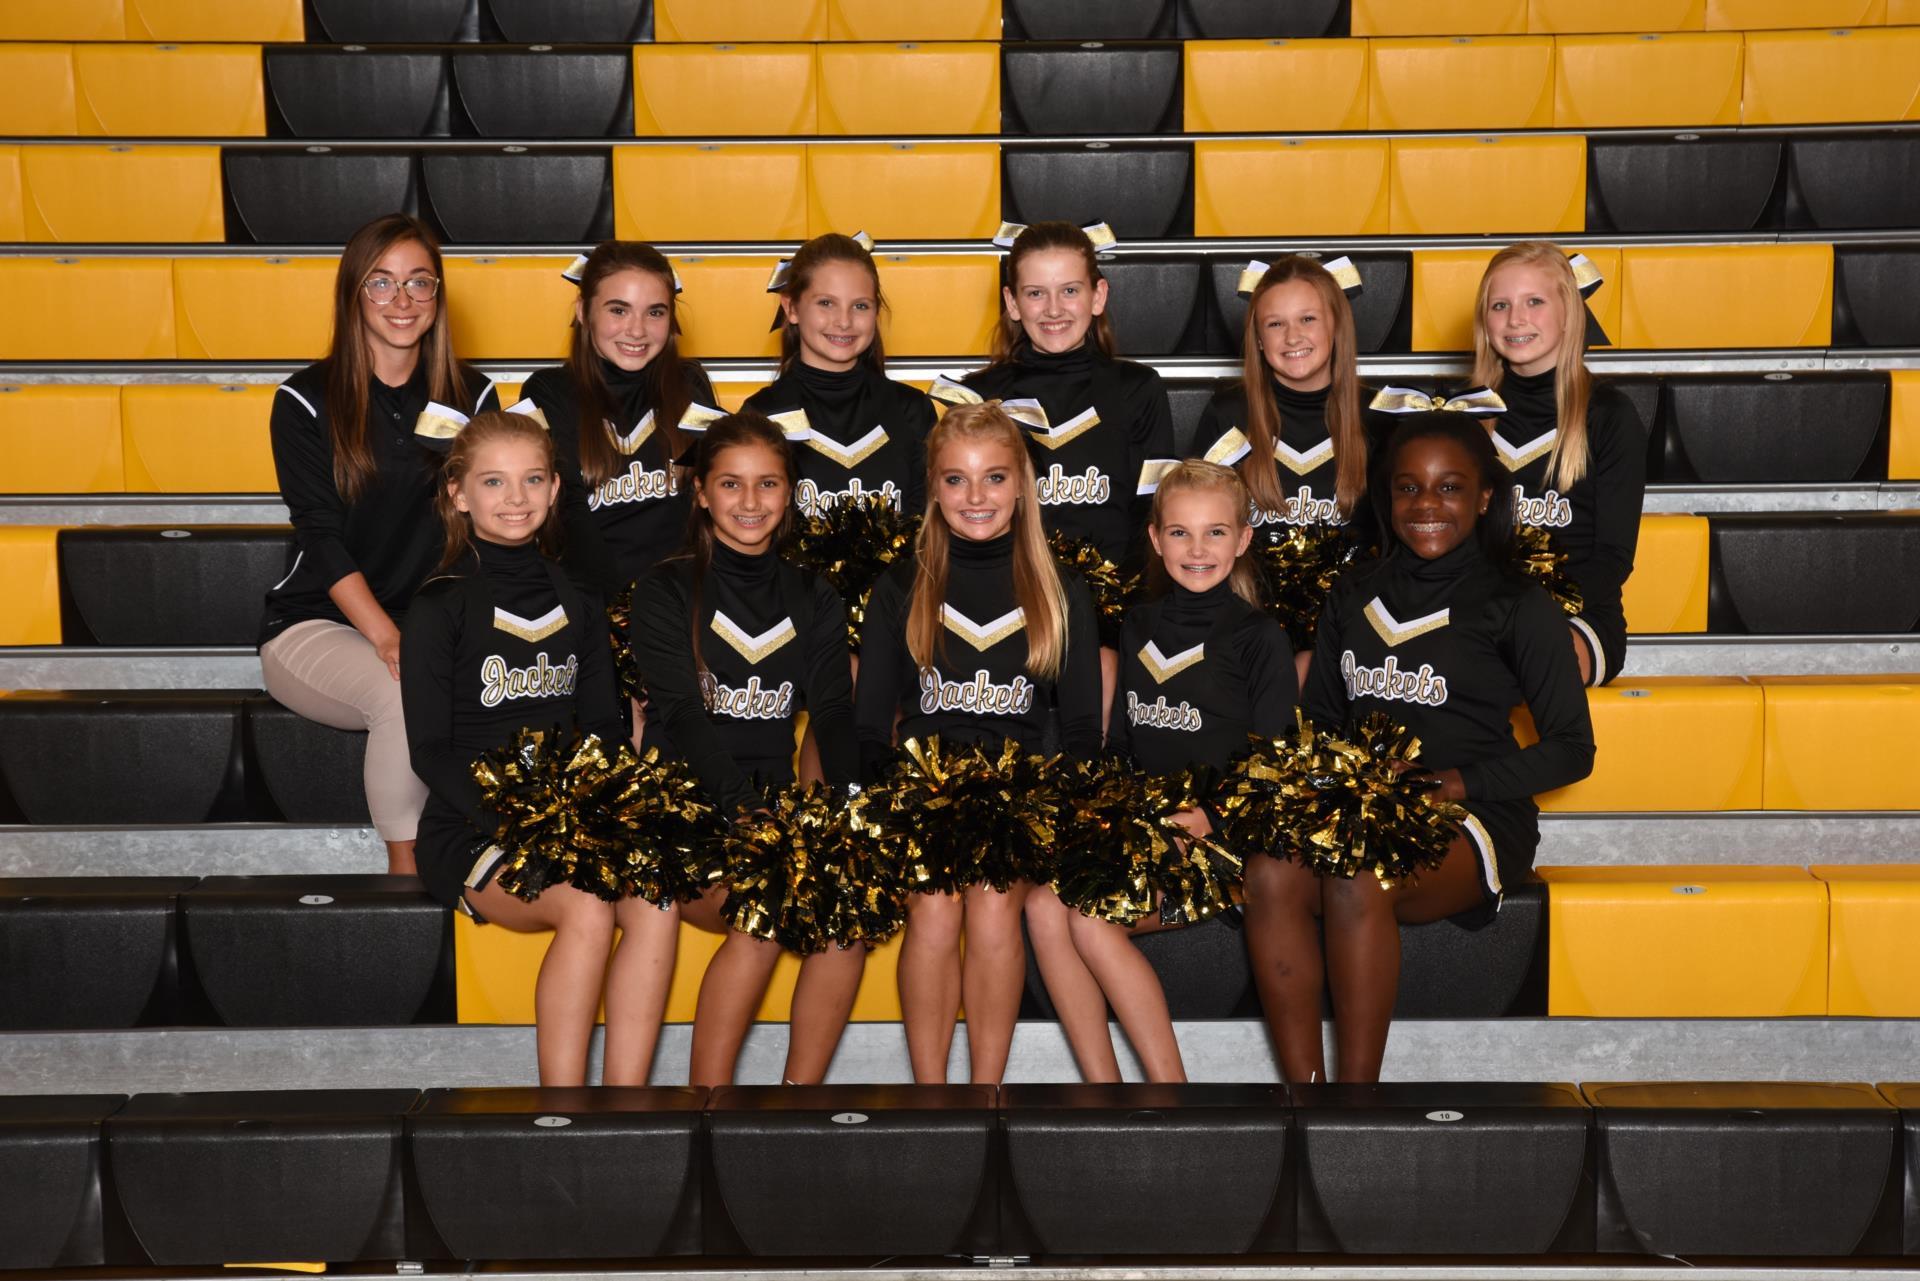 2017 7th grade football cheerleaders